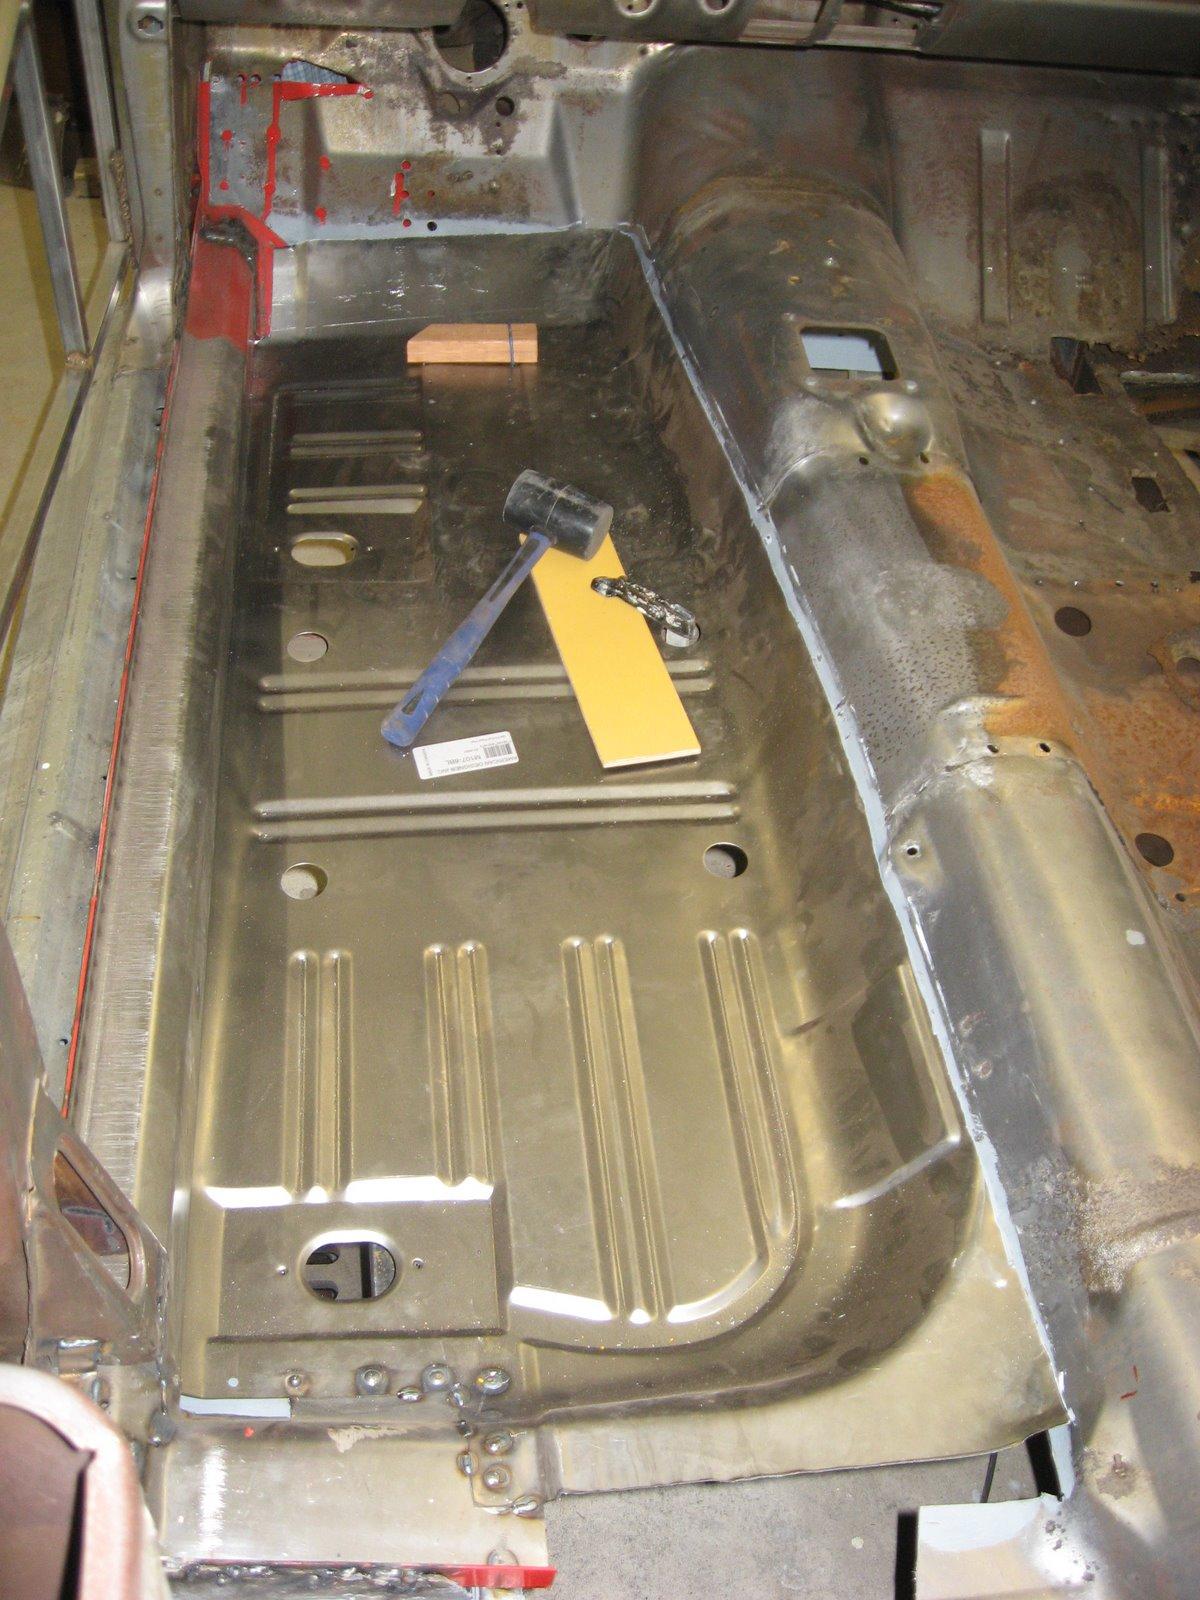 Restoration of a 1965 mustang driver side floor pans for 1965 mustang floor pan